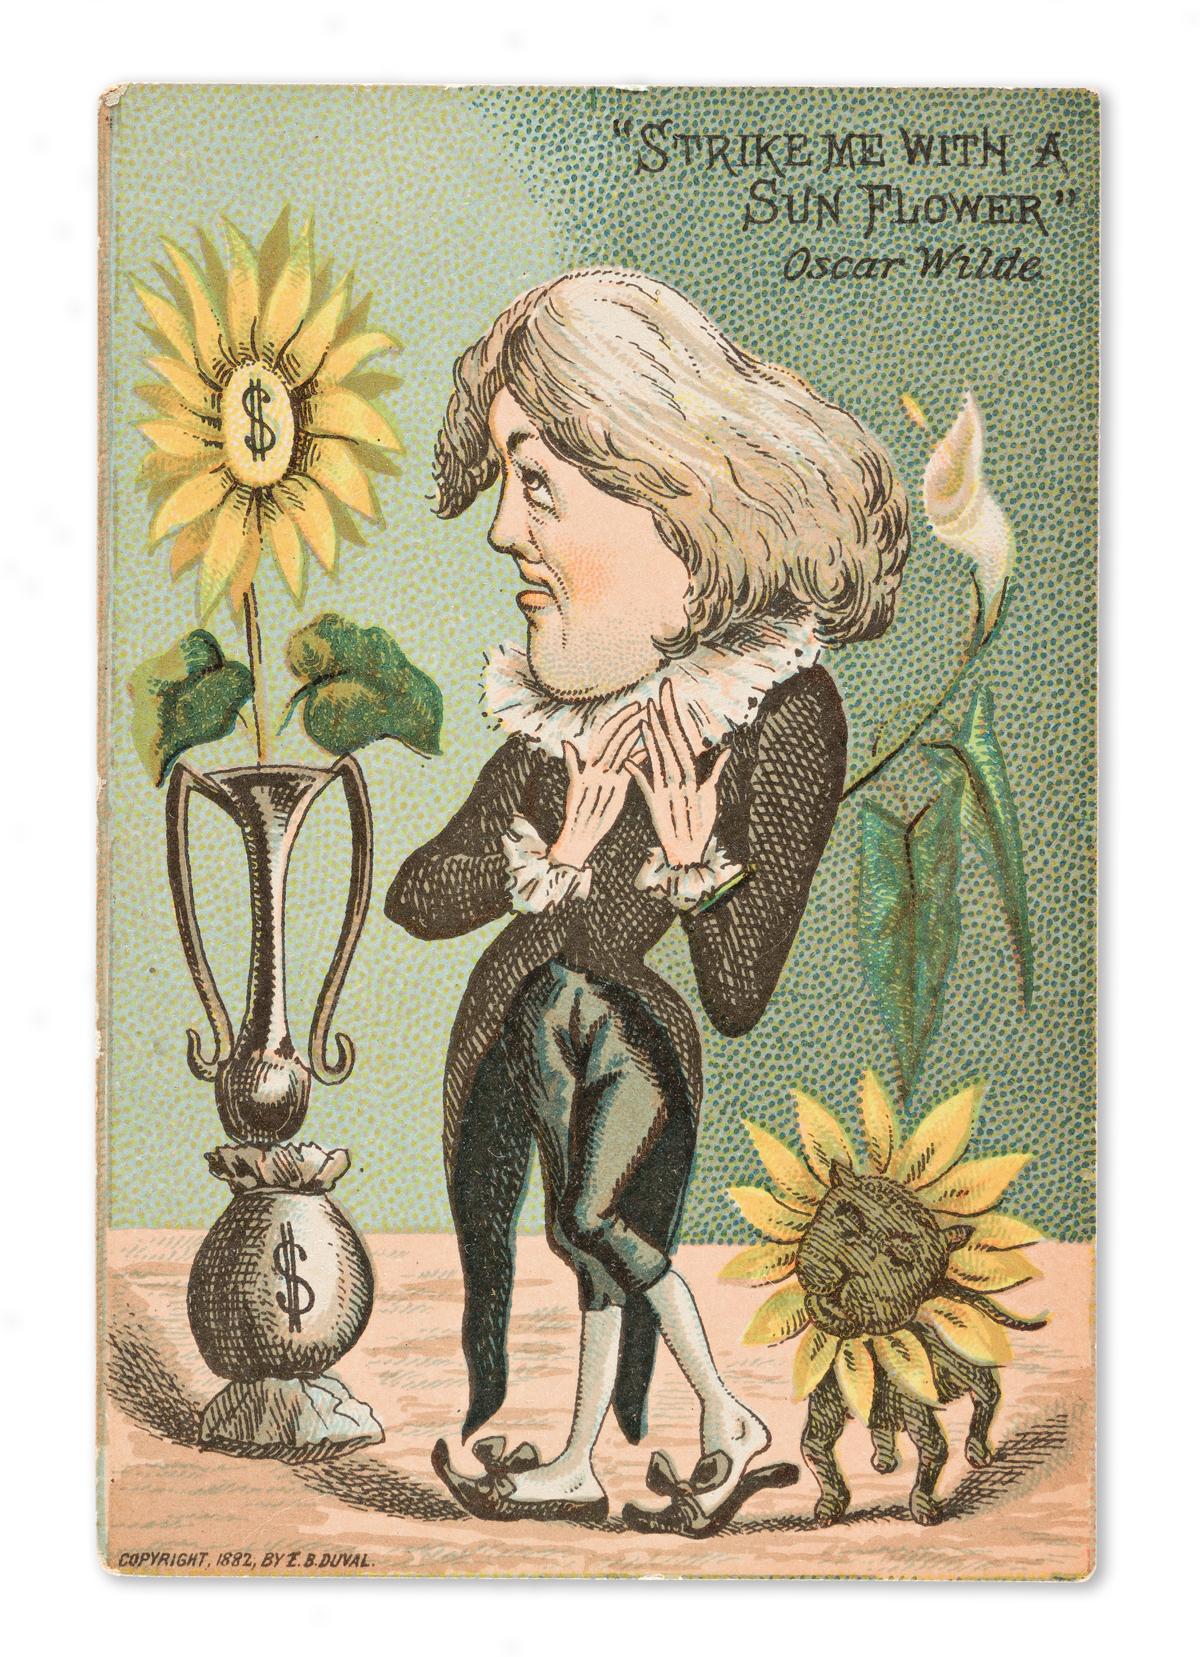 OSCAR WILDE (1854-1900) Group of Oscar Wilde advertising cards and theatrical photos.